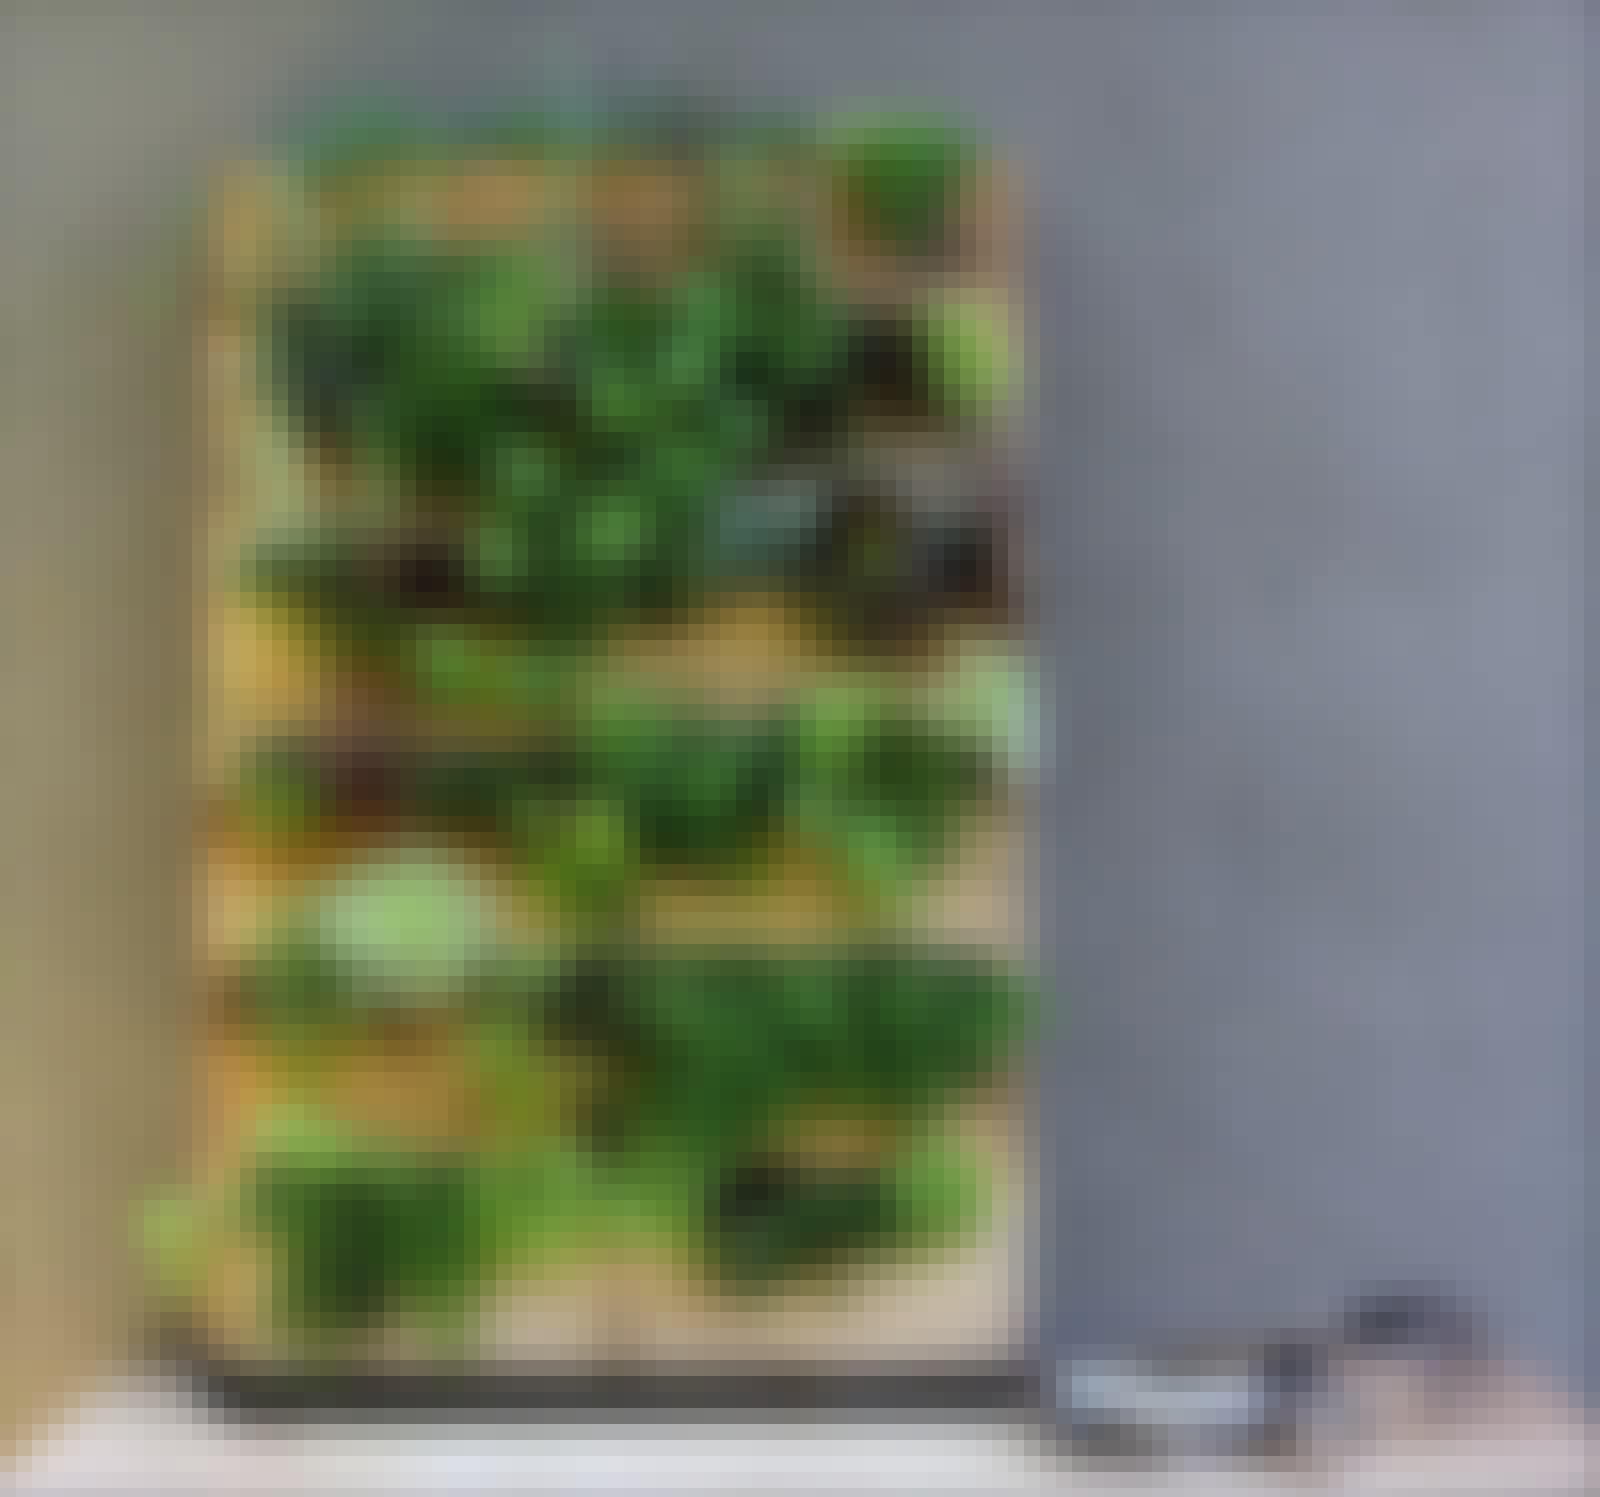 Paller plantekasser bed planter have